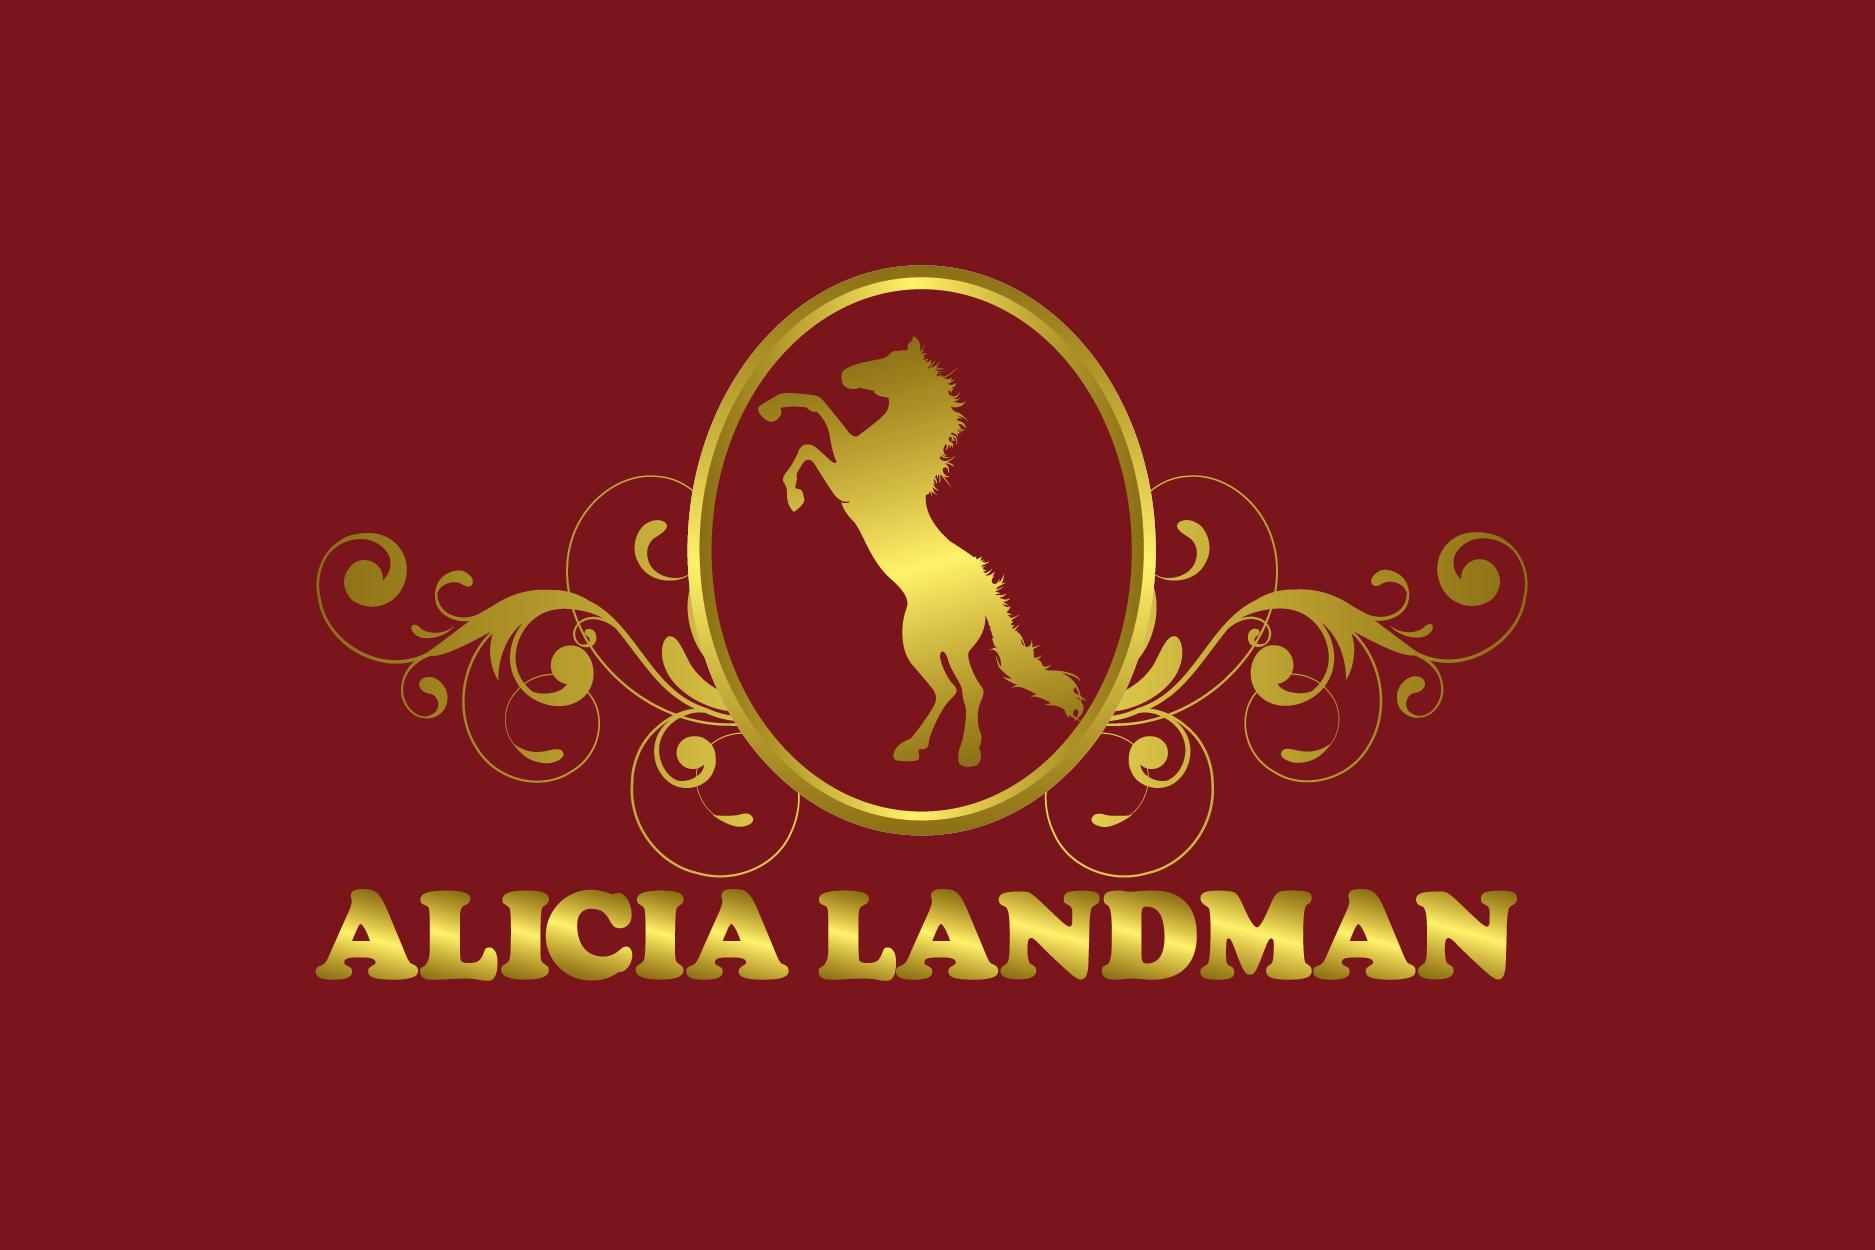 Logo Design by Private User - Entry No. 89 in the Logo Design Contest Fun Logo Design for Alicia Landman.